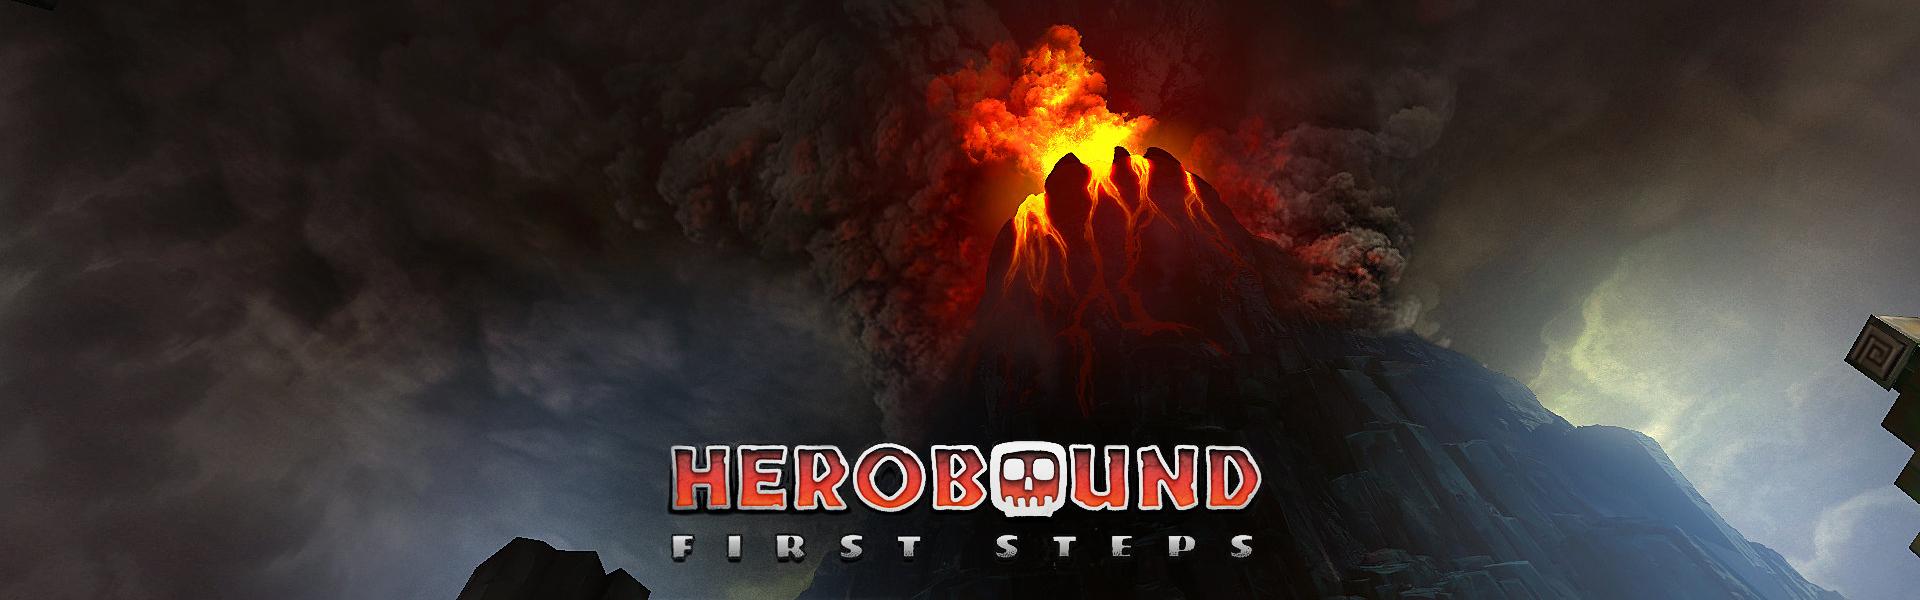 http://robwestwood.com/wp-content/uploads/2013/01/Herobound-1-Banner.jpg